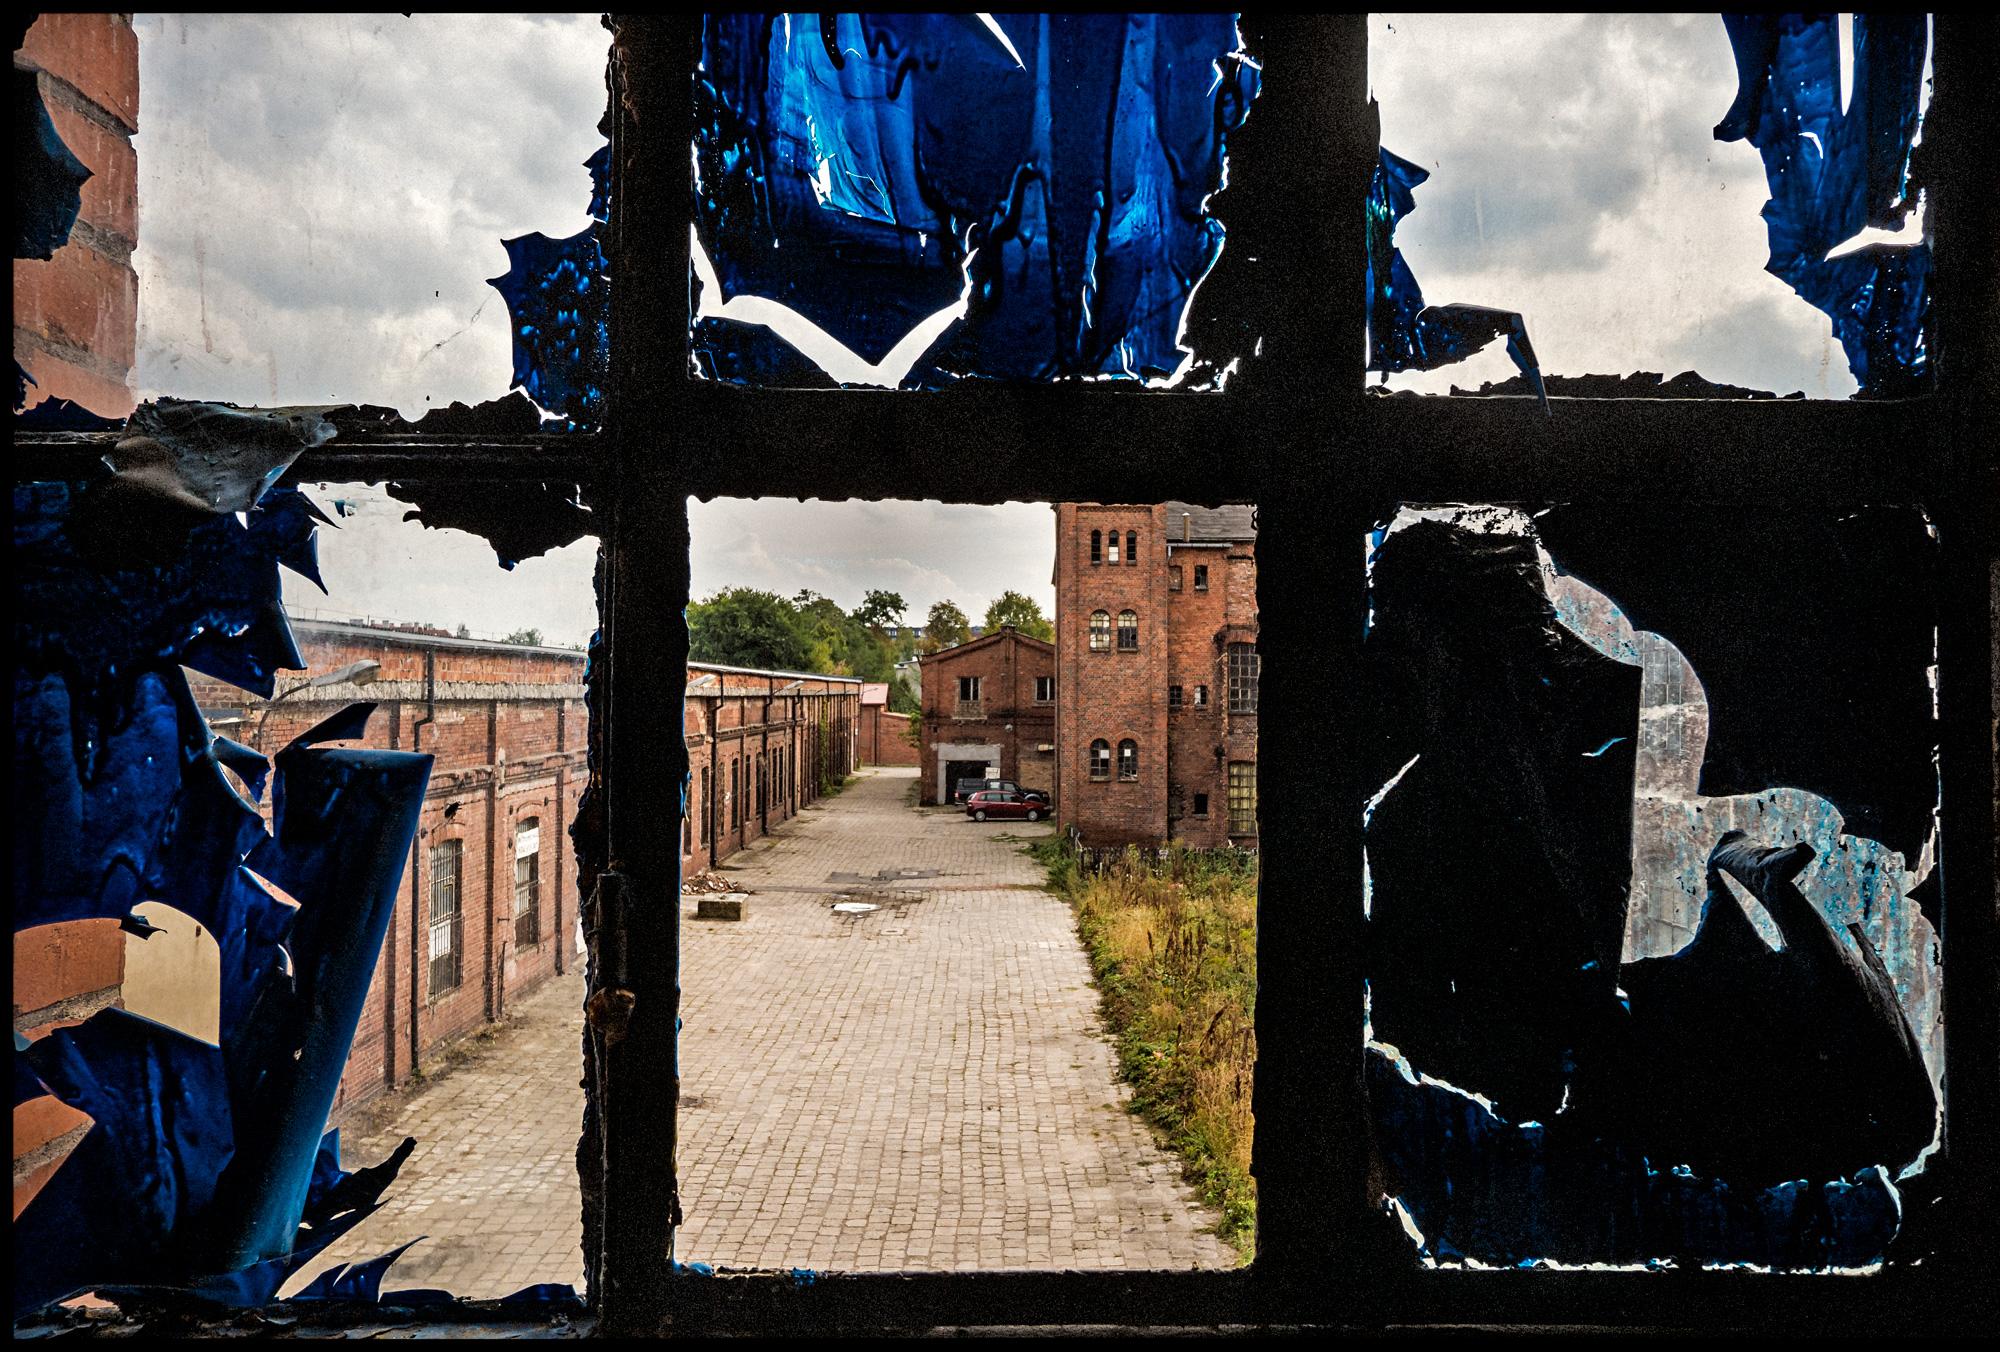 2015_09_08-Zyrardow_Poland_broken-window-view_0550.jpg